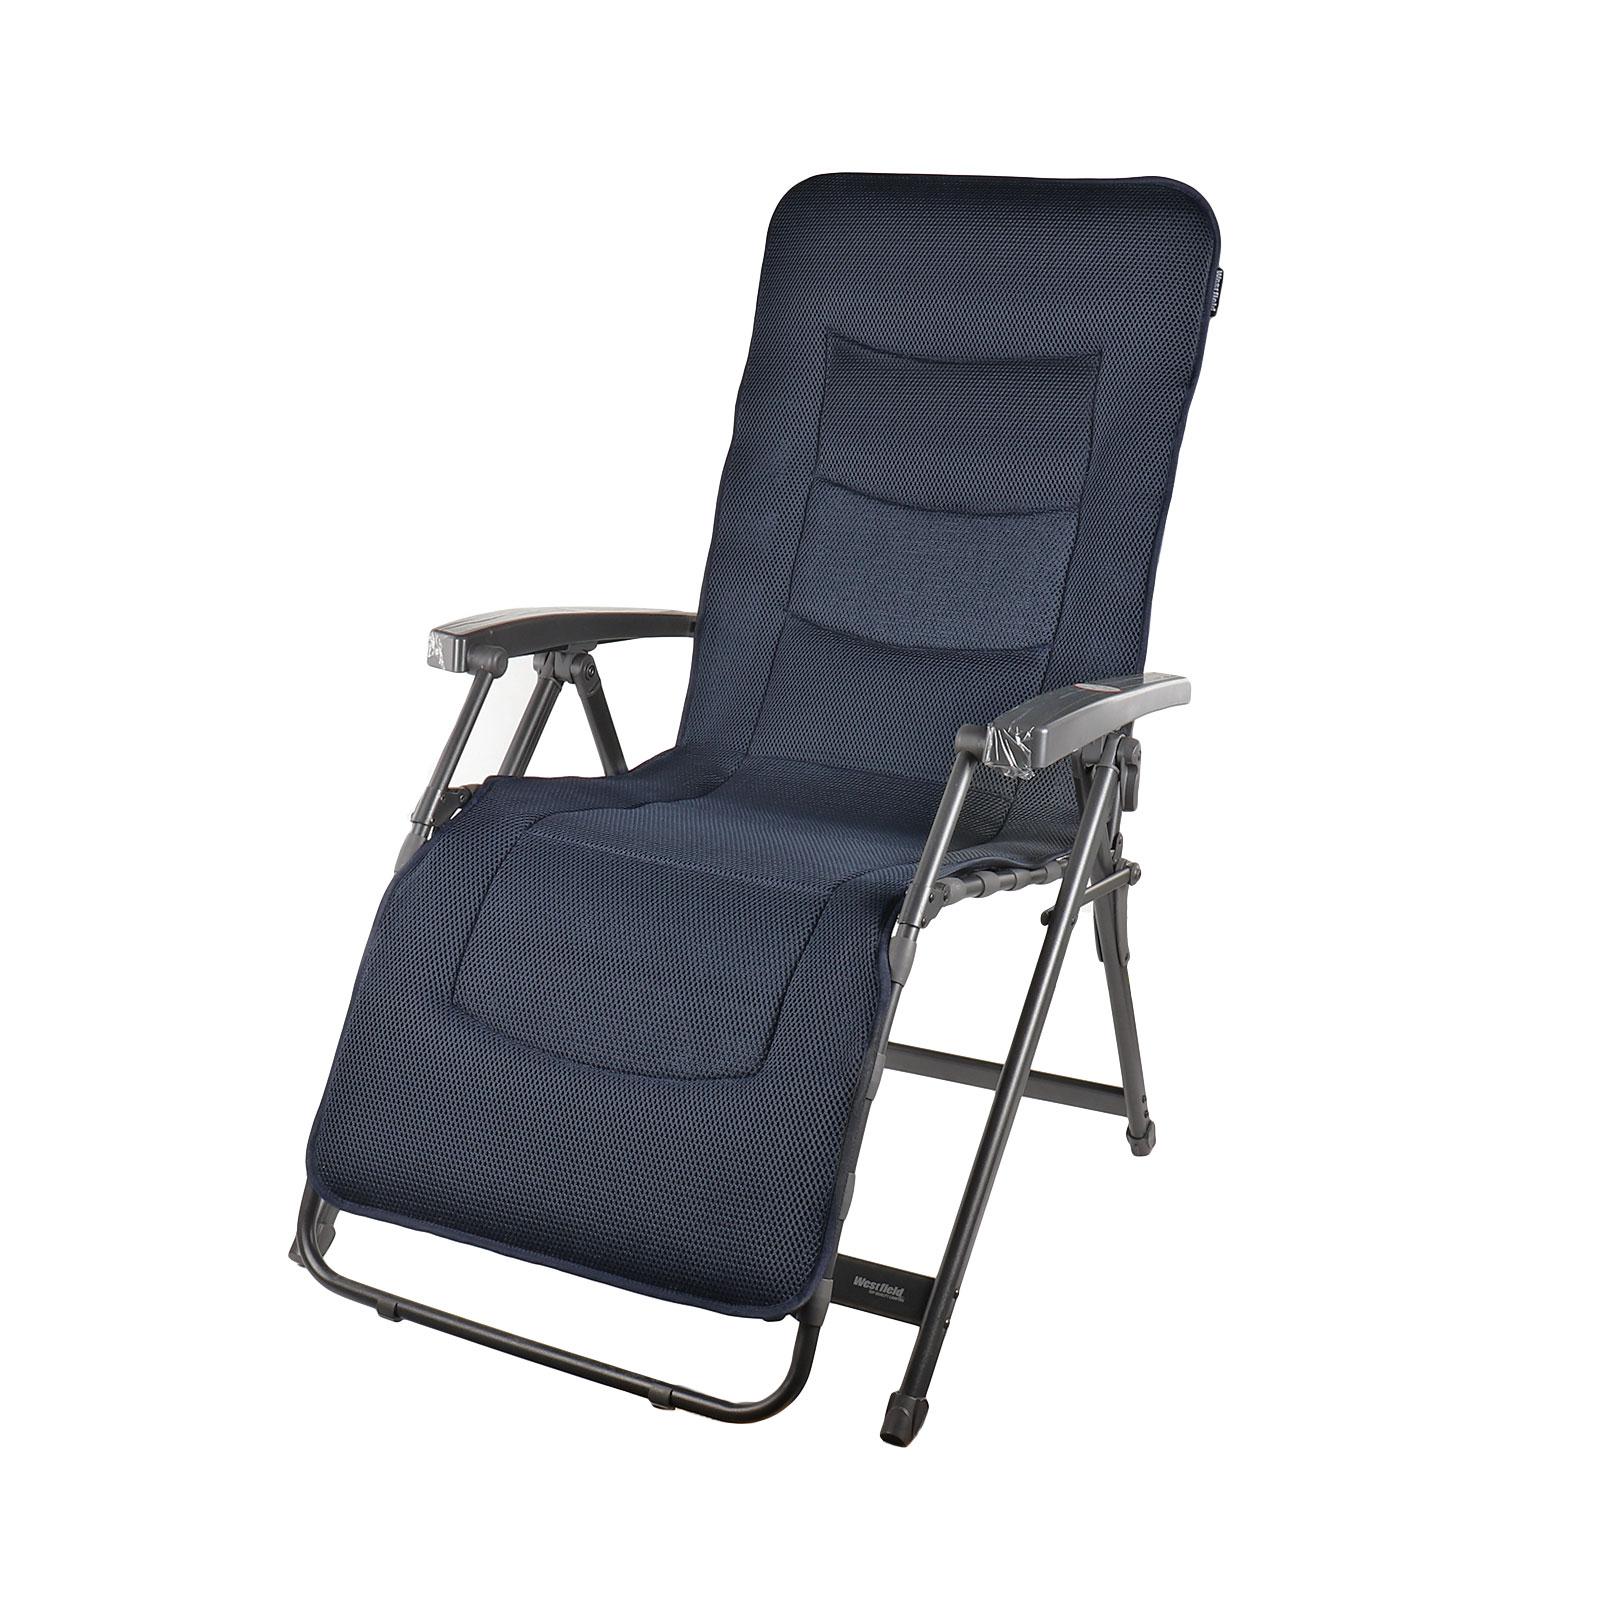 Westfield Lounge Sessel   Camping Stuhl   Liegestuhl   Aeronaut   Grau   140 Kg